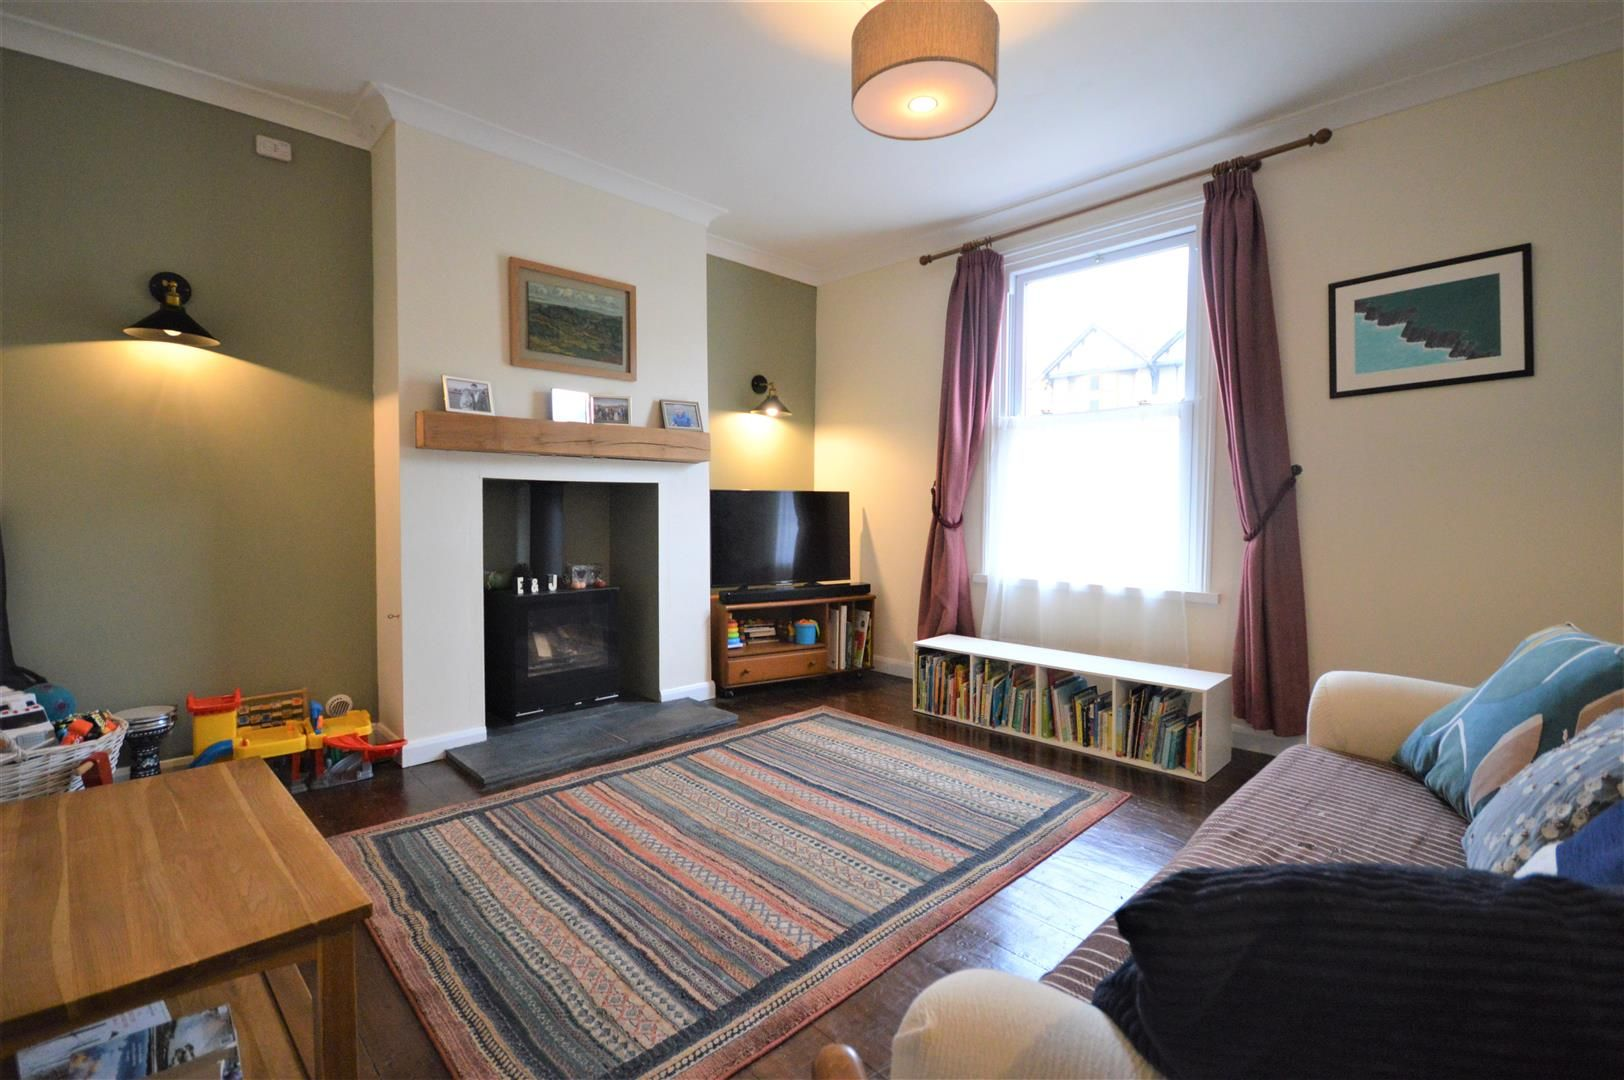 3 bed detached for sale in Leominster  - Property Image 3